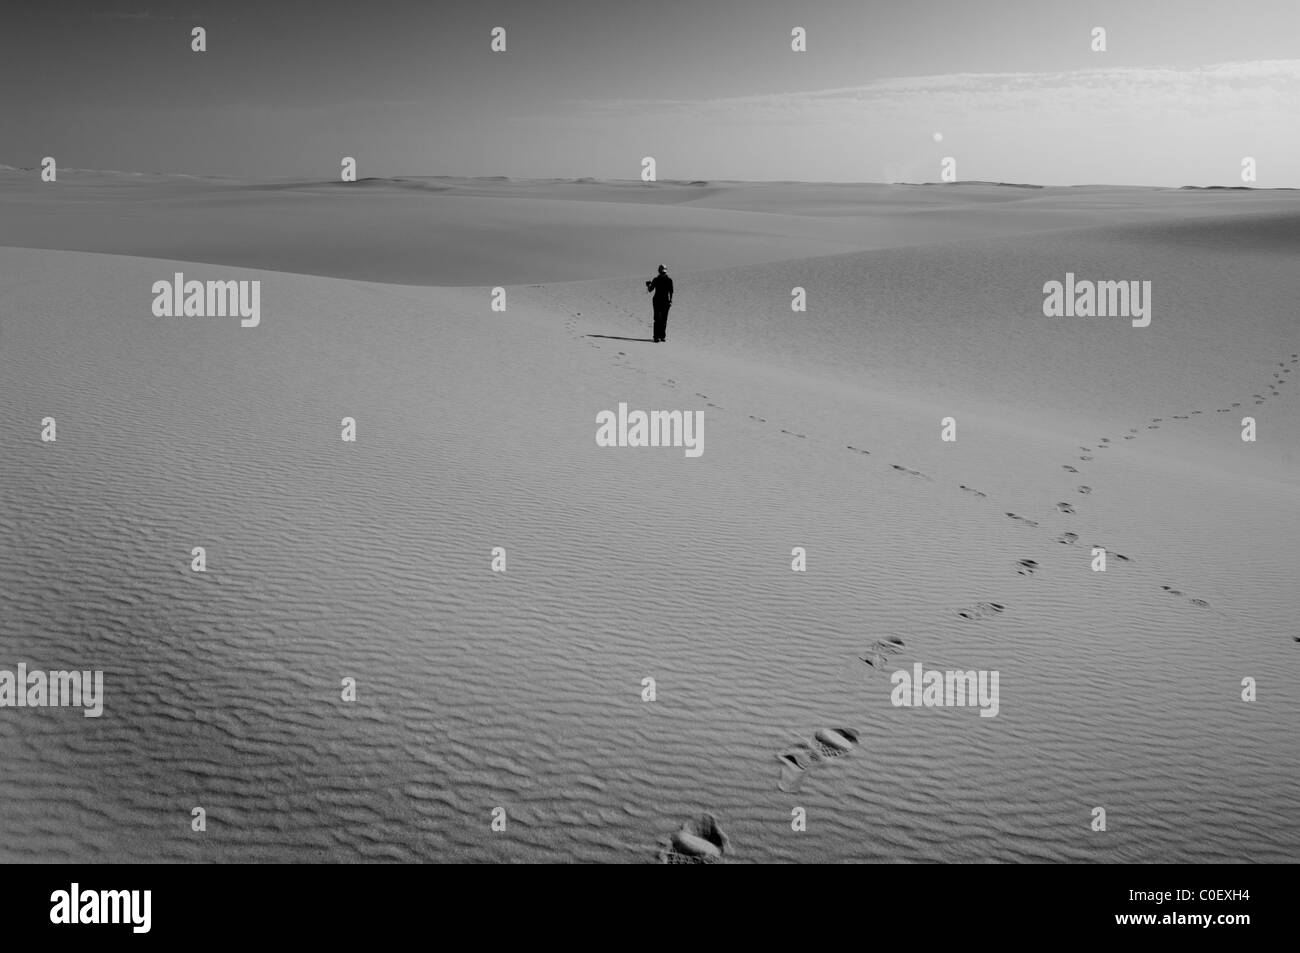 Lone Figure in the Sahara Desert - Stock Image